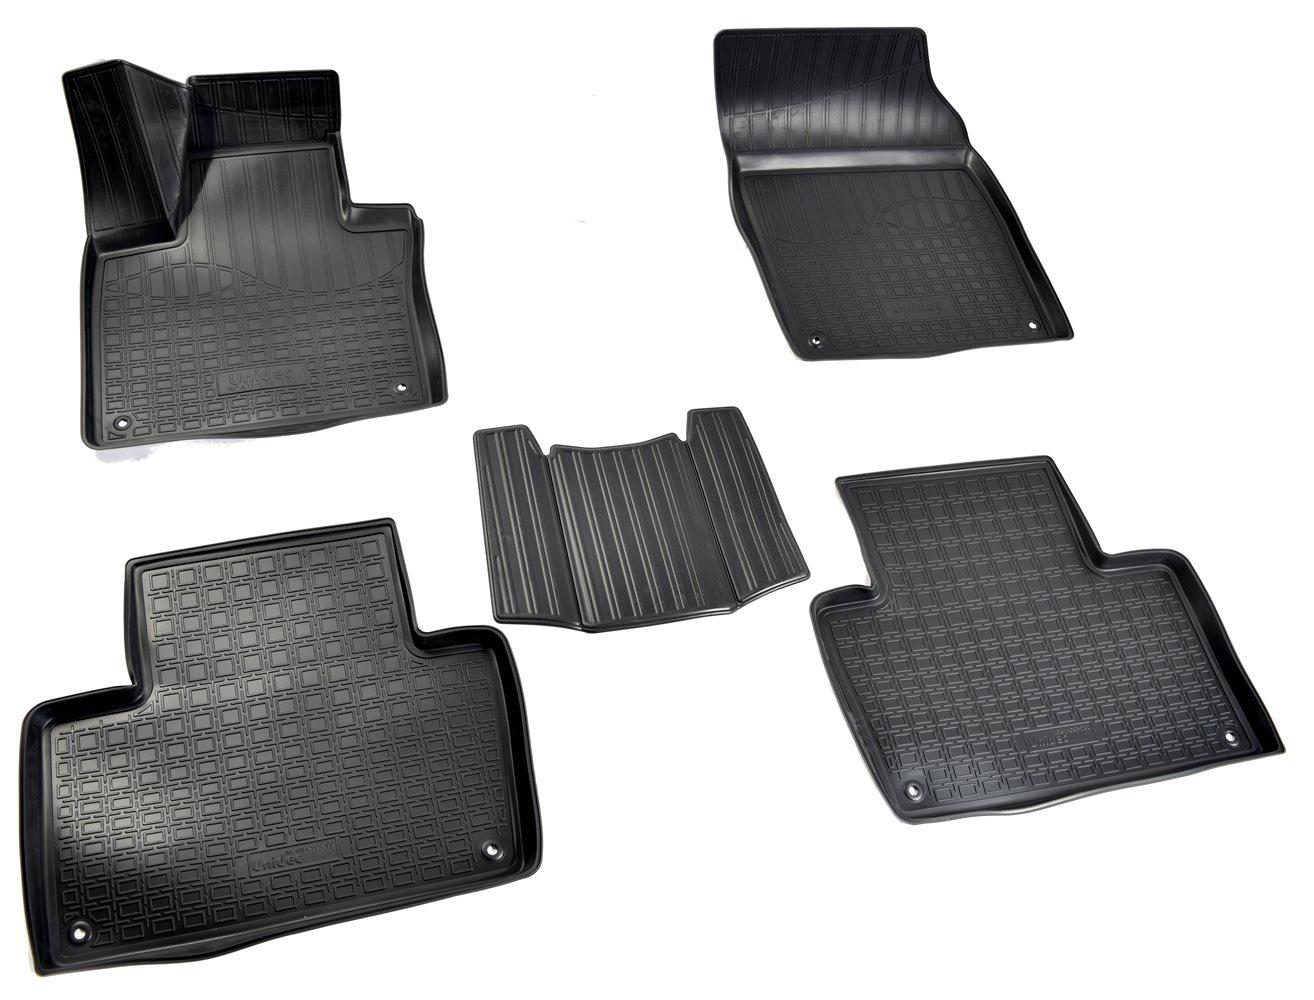 Коврики в салон автомобиля Norplast для Volvo XC90 3D (2015) (5 мест), NPA11-C96-780, черный декоративные салонные накладки chn для volvo xc90 2006 2014